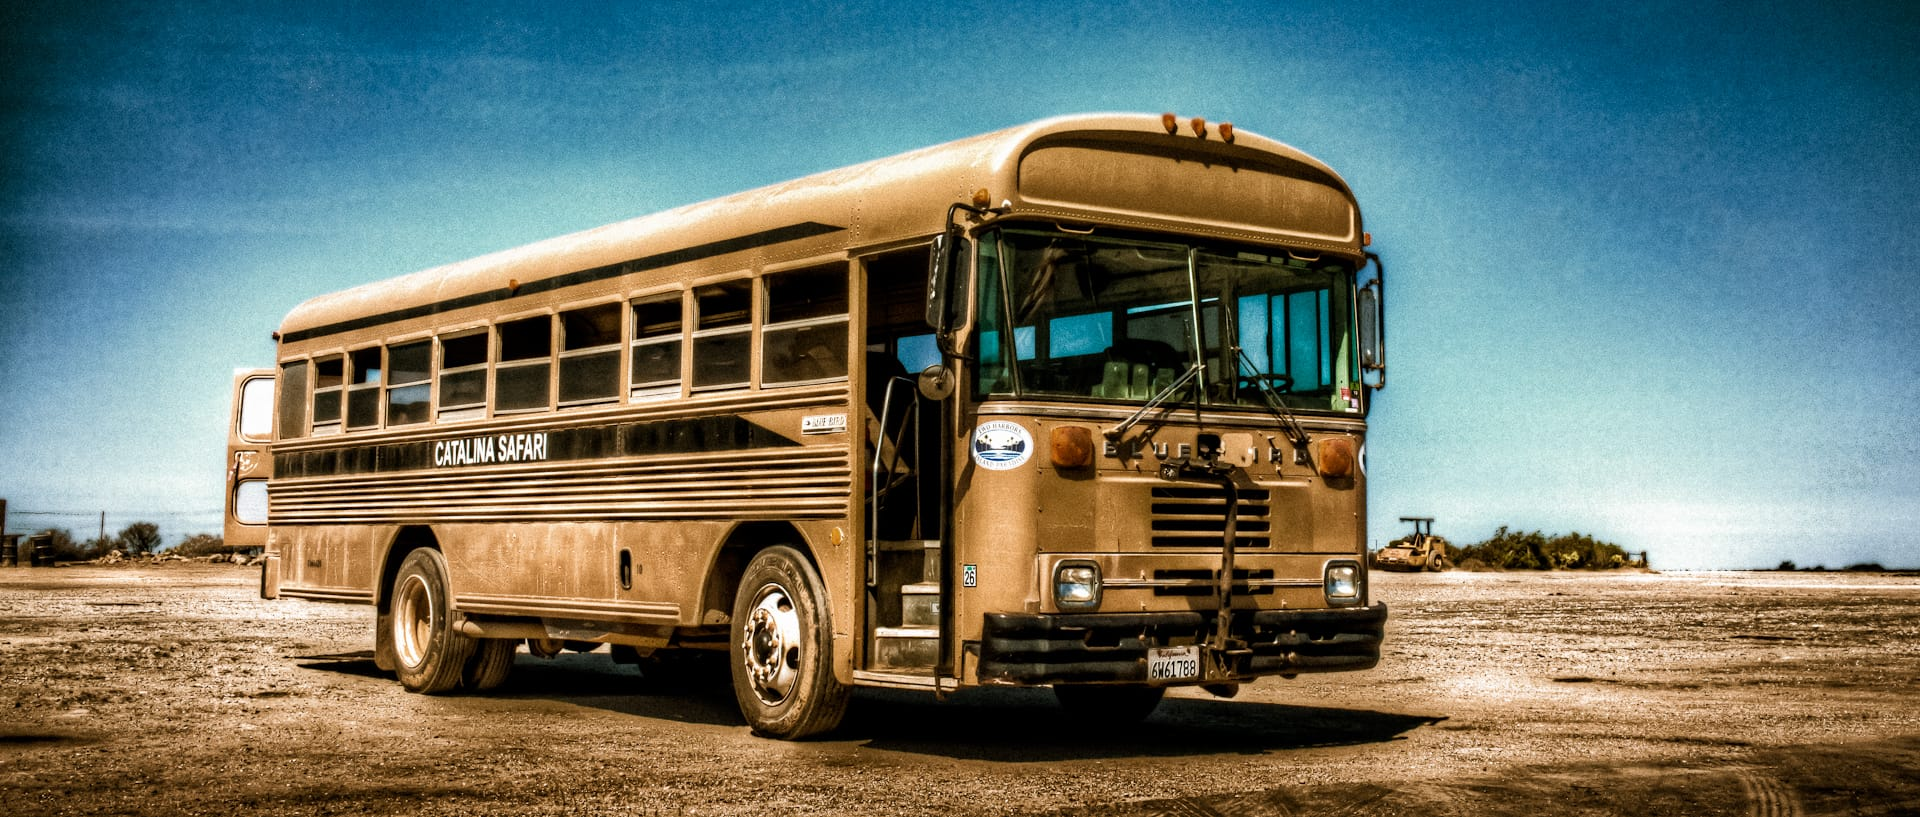 catalina safari bus